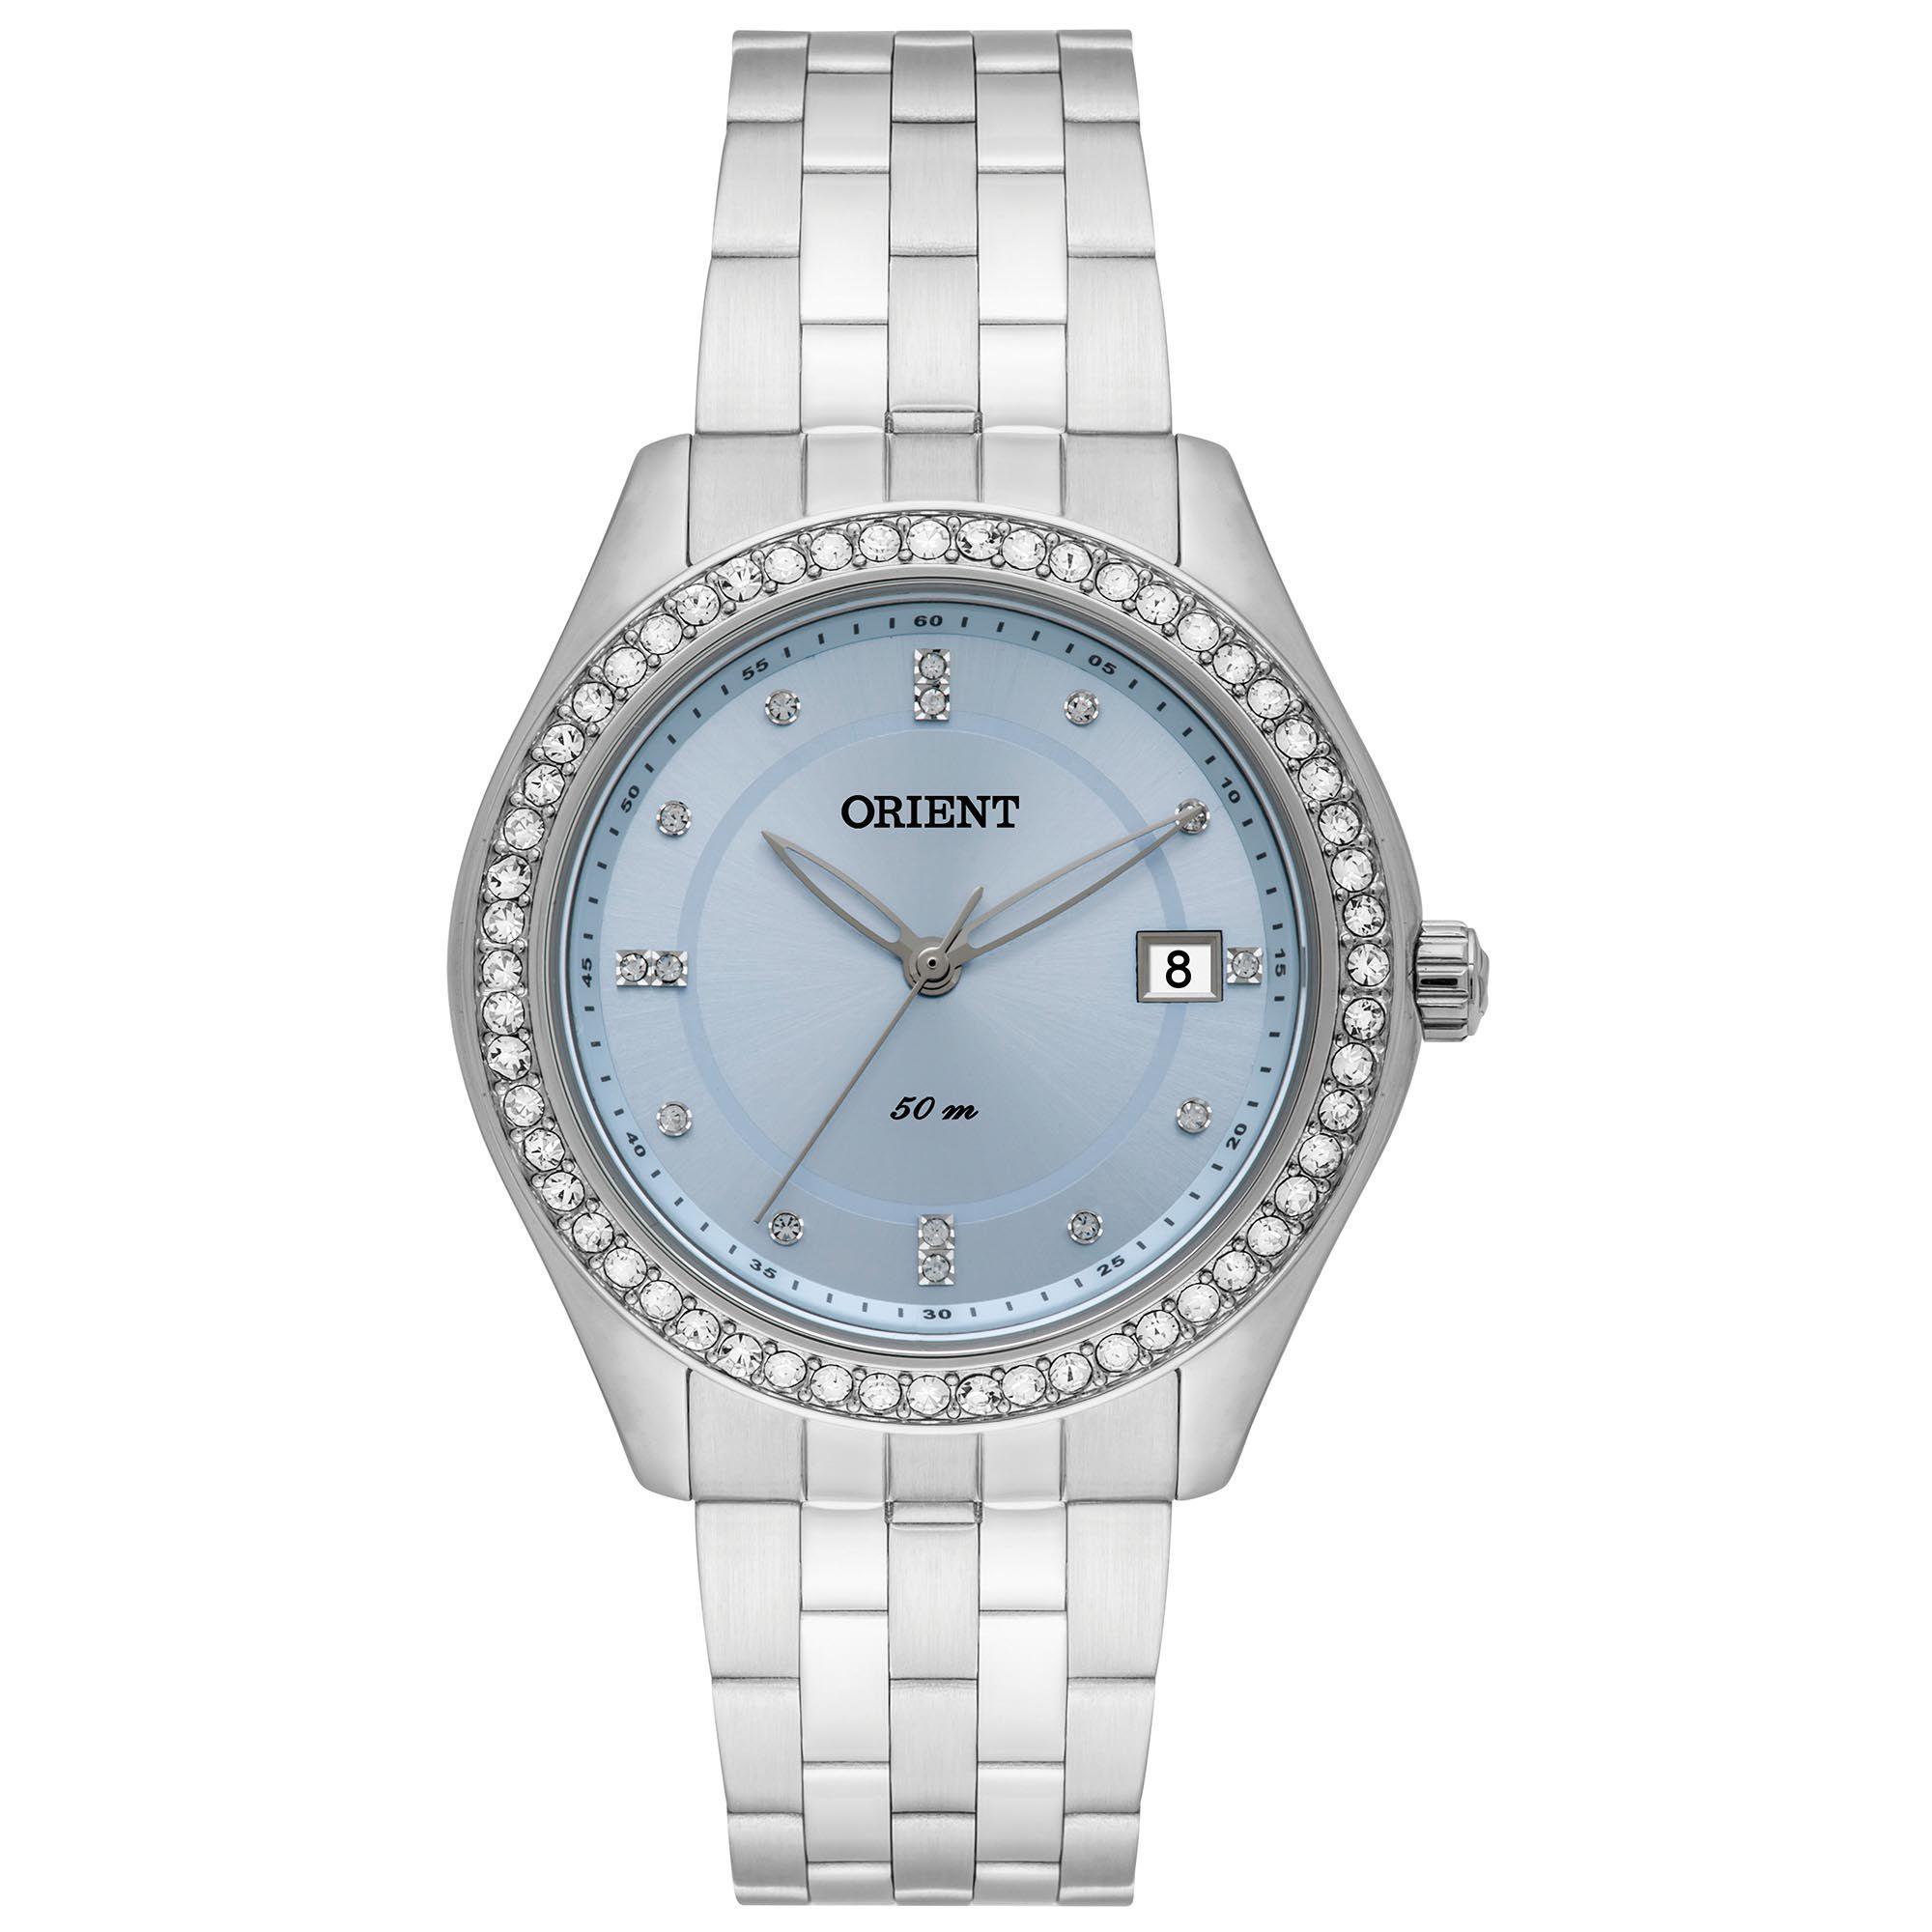 Relógio Feminino Orient FBSS1107 A1SX